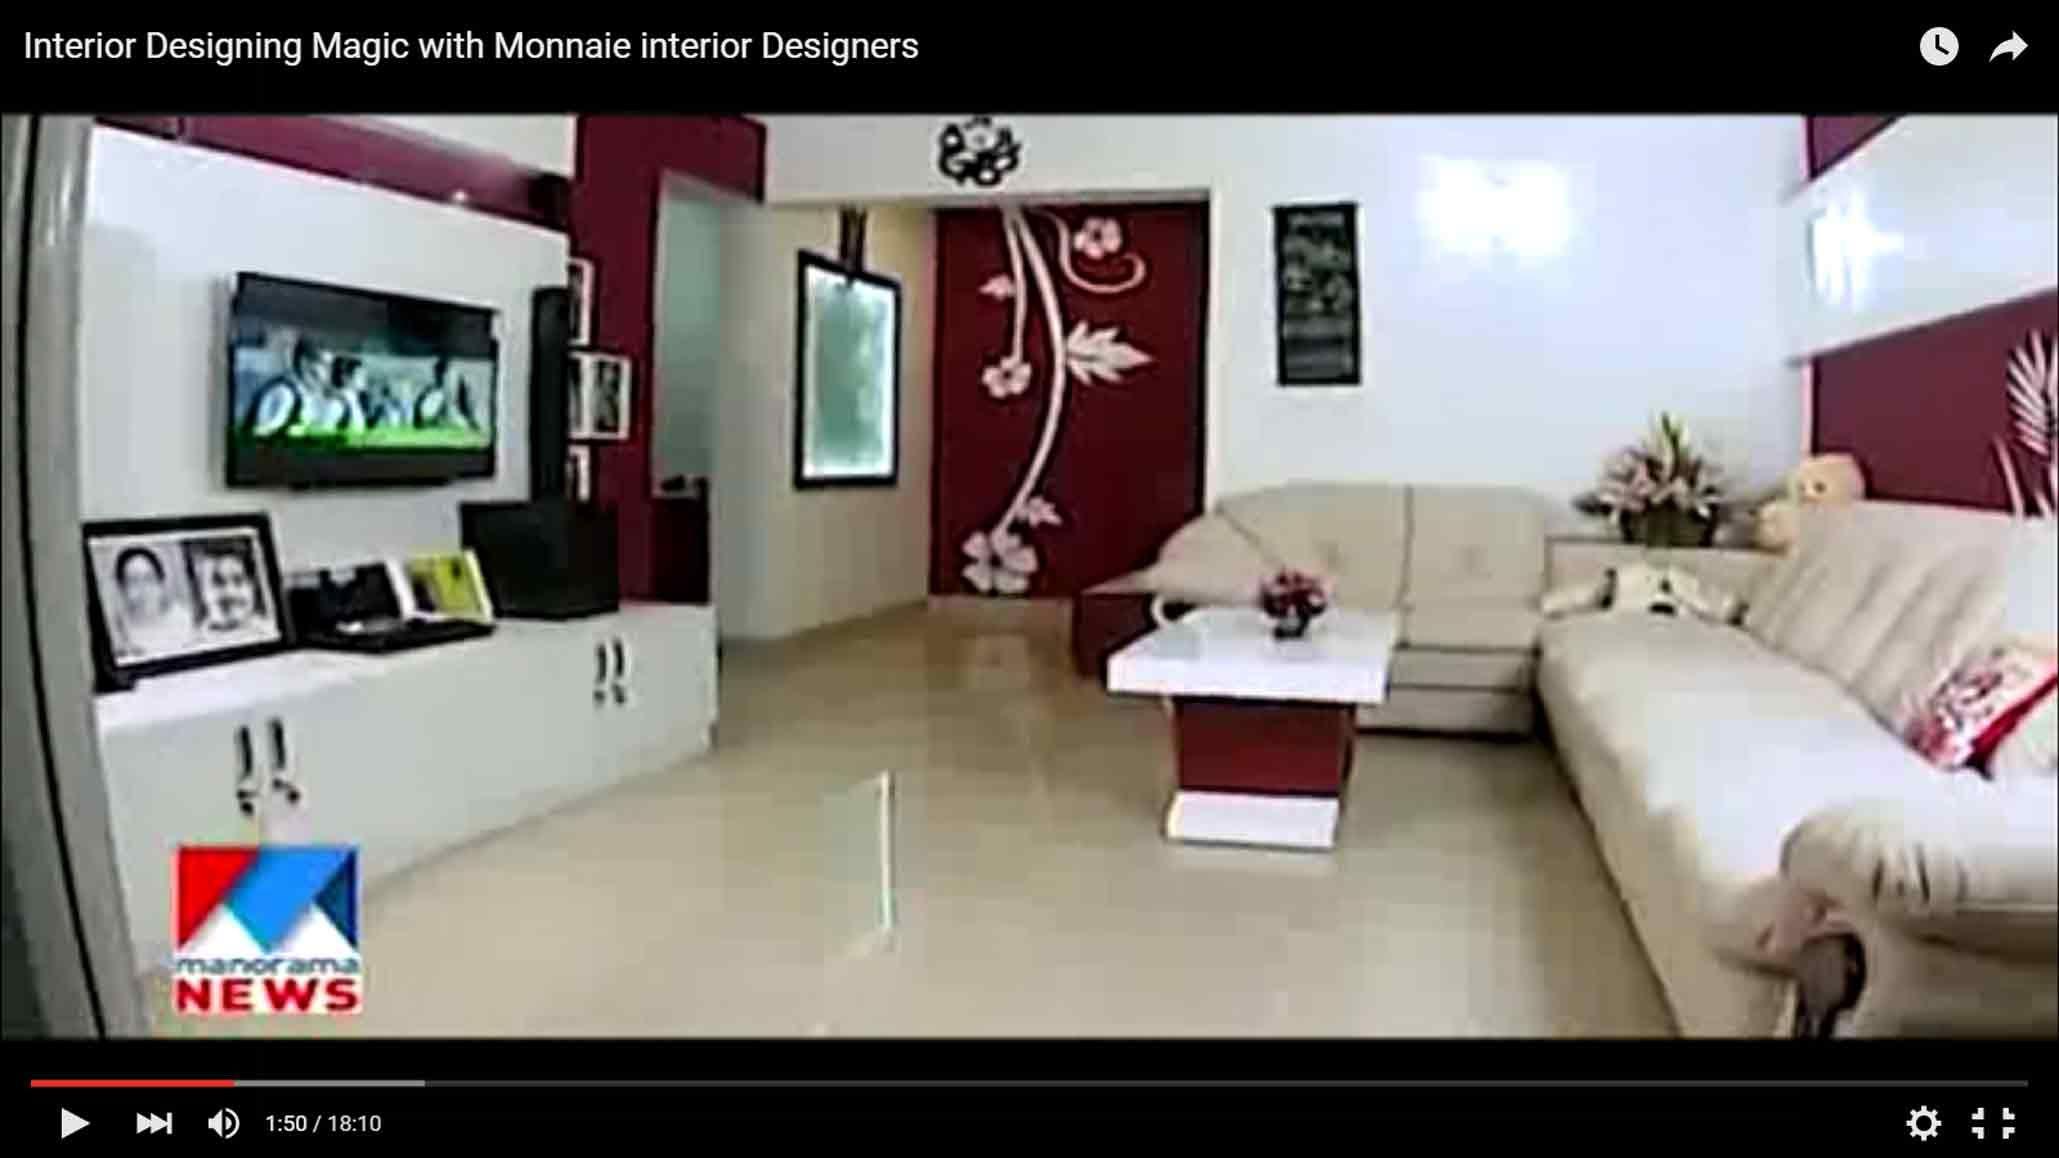 Low Cost Home Interior Design In Kerala Architects In Trivandrum Calicut Top Interior Designers Unique House Design Interior